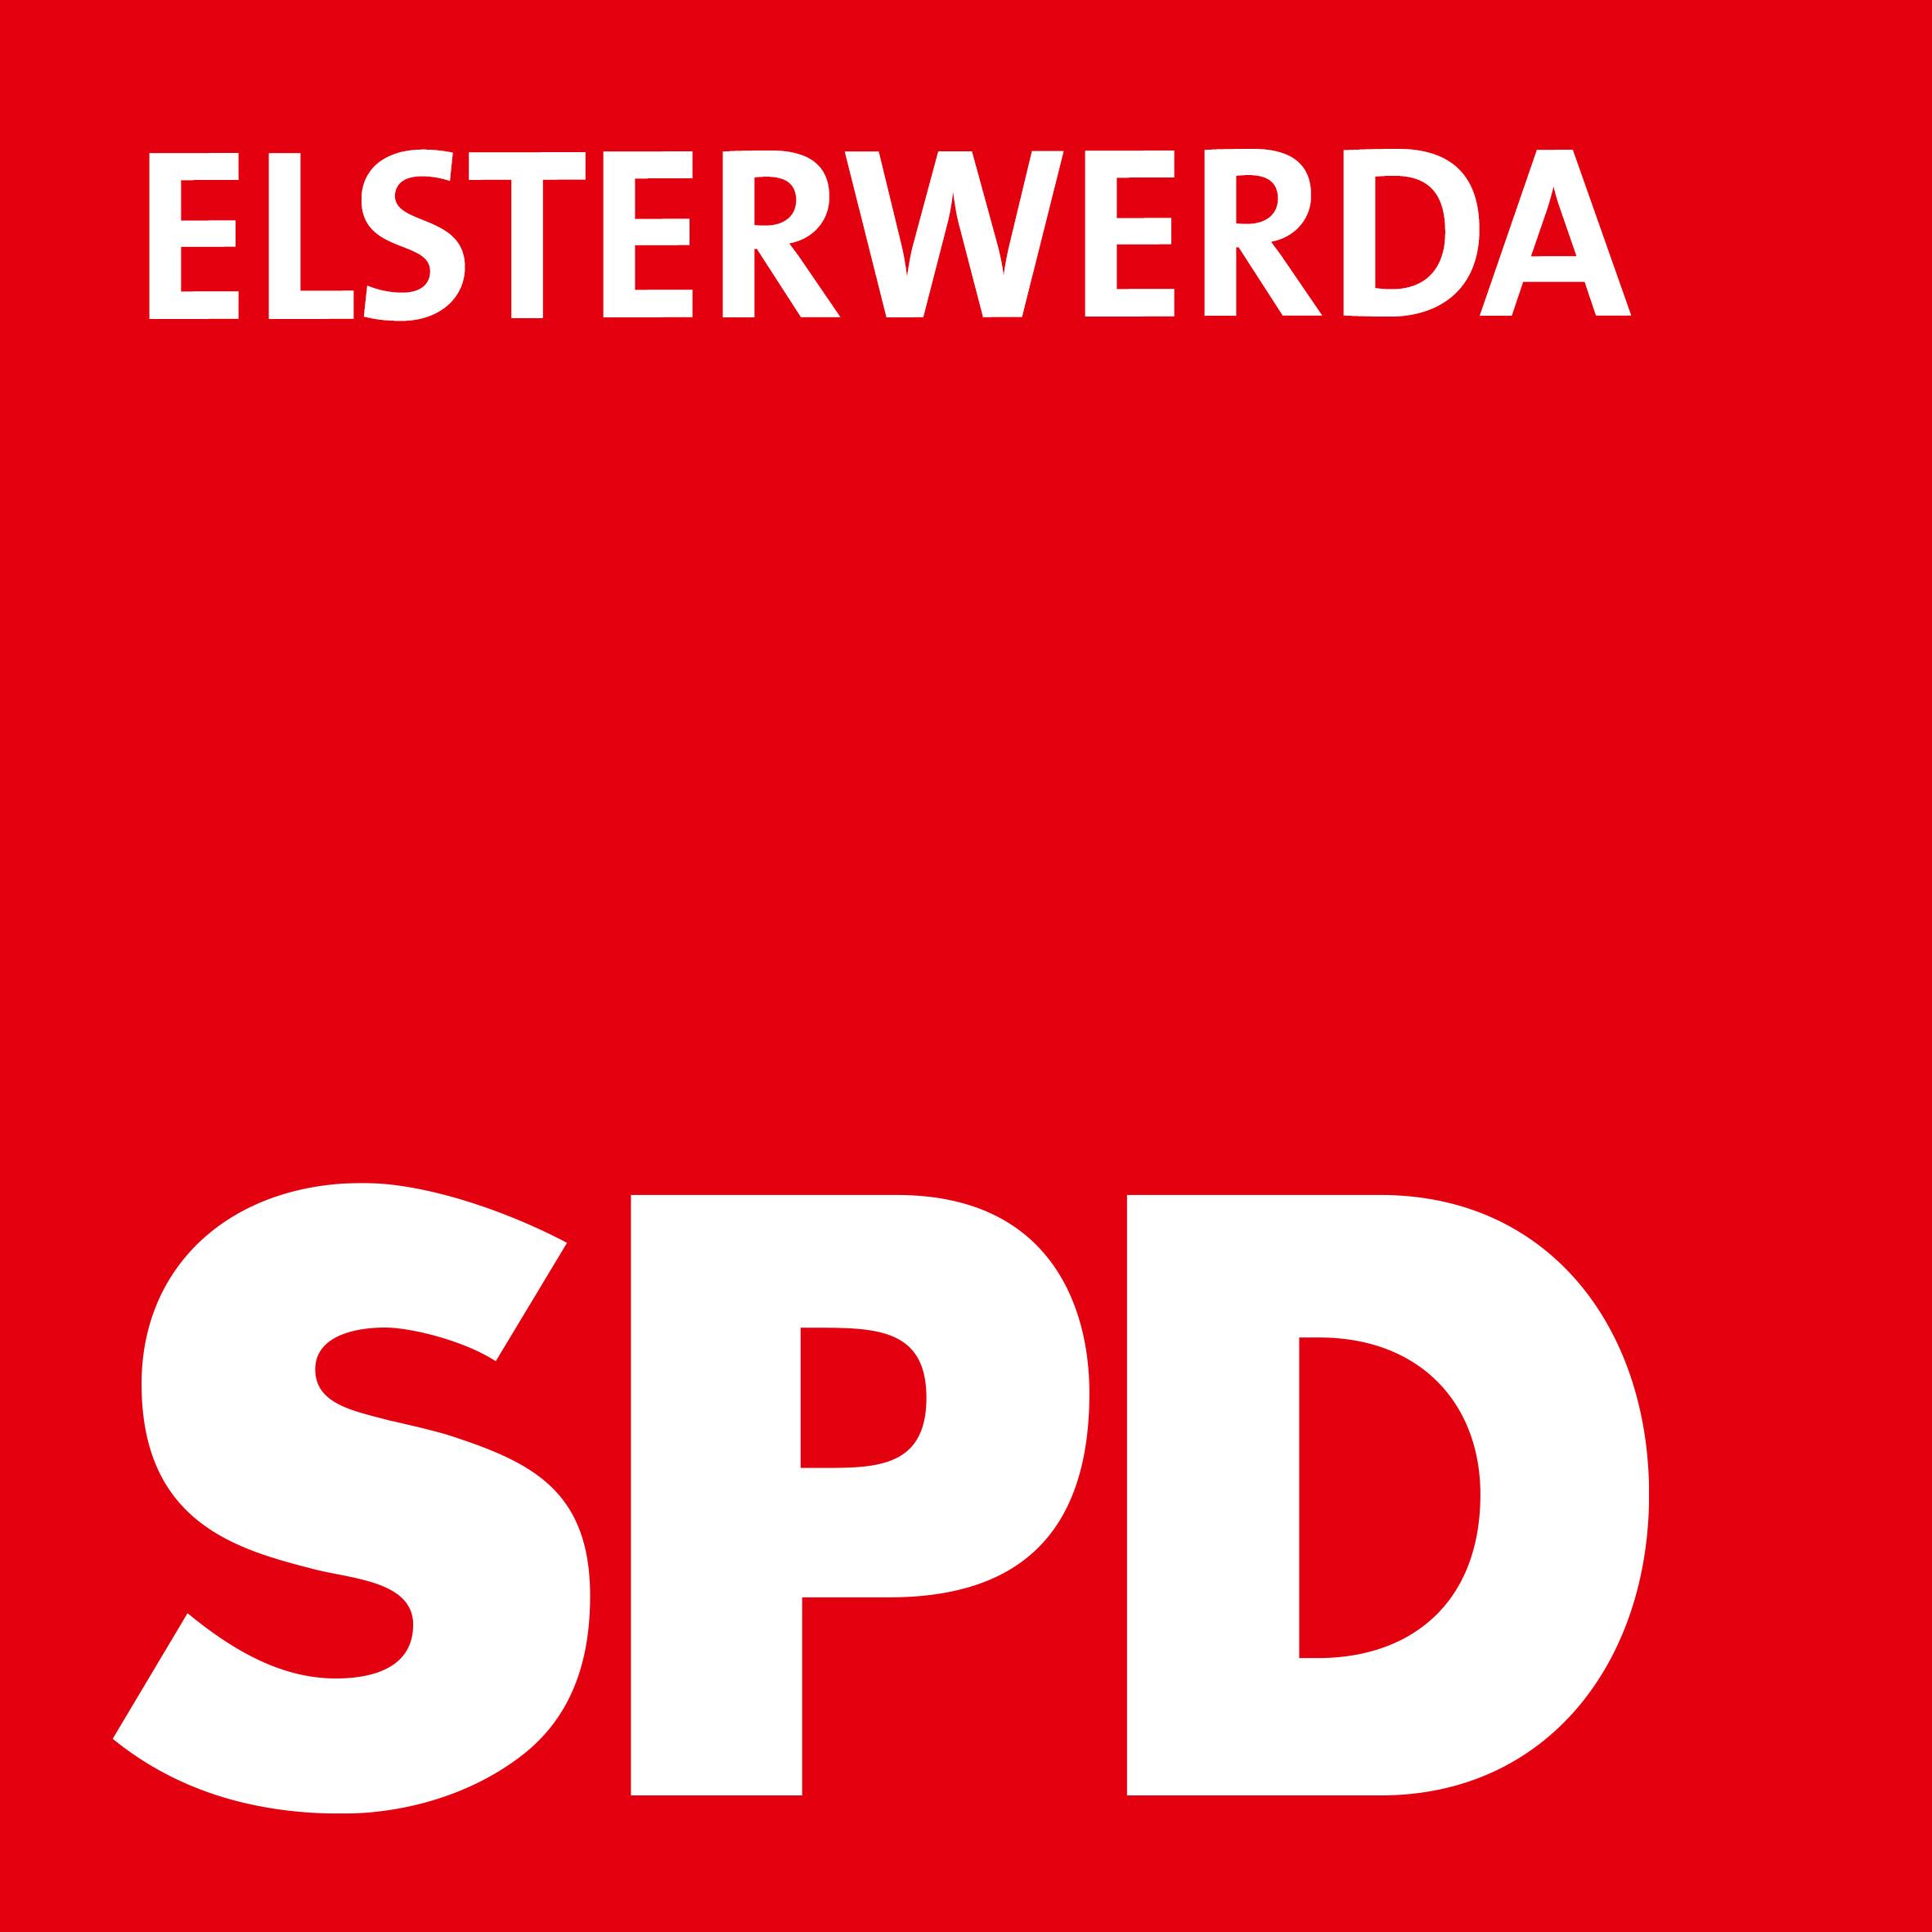 SPD Elsterwerda